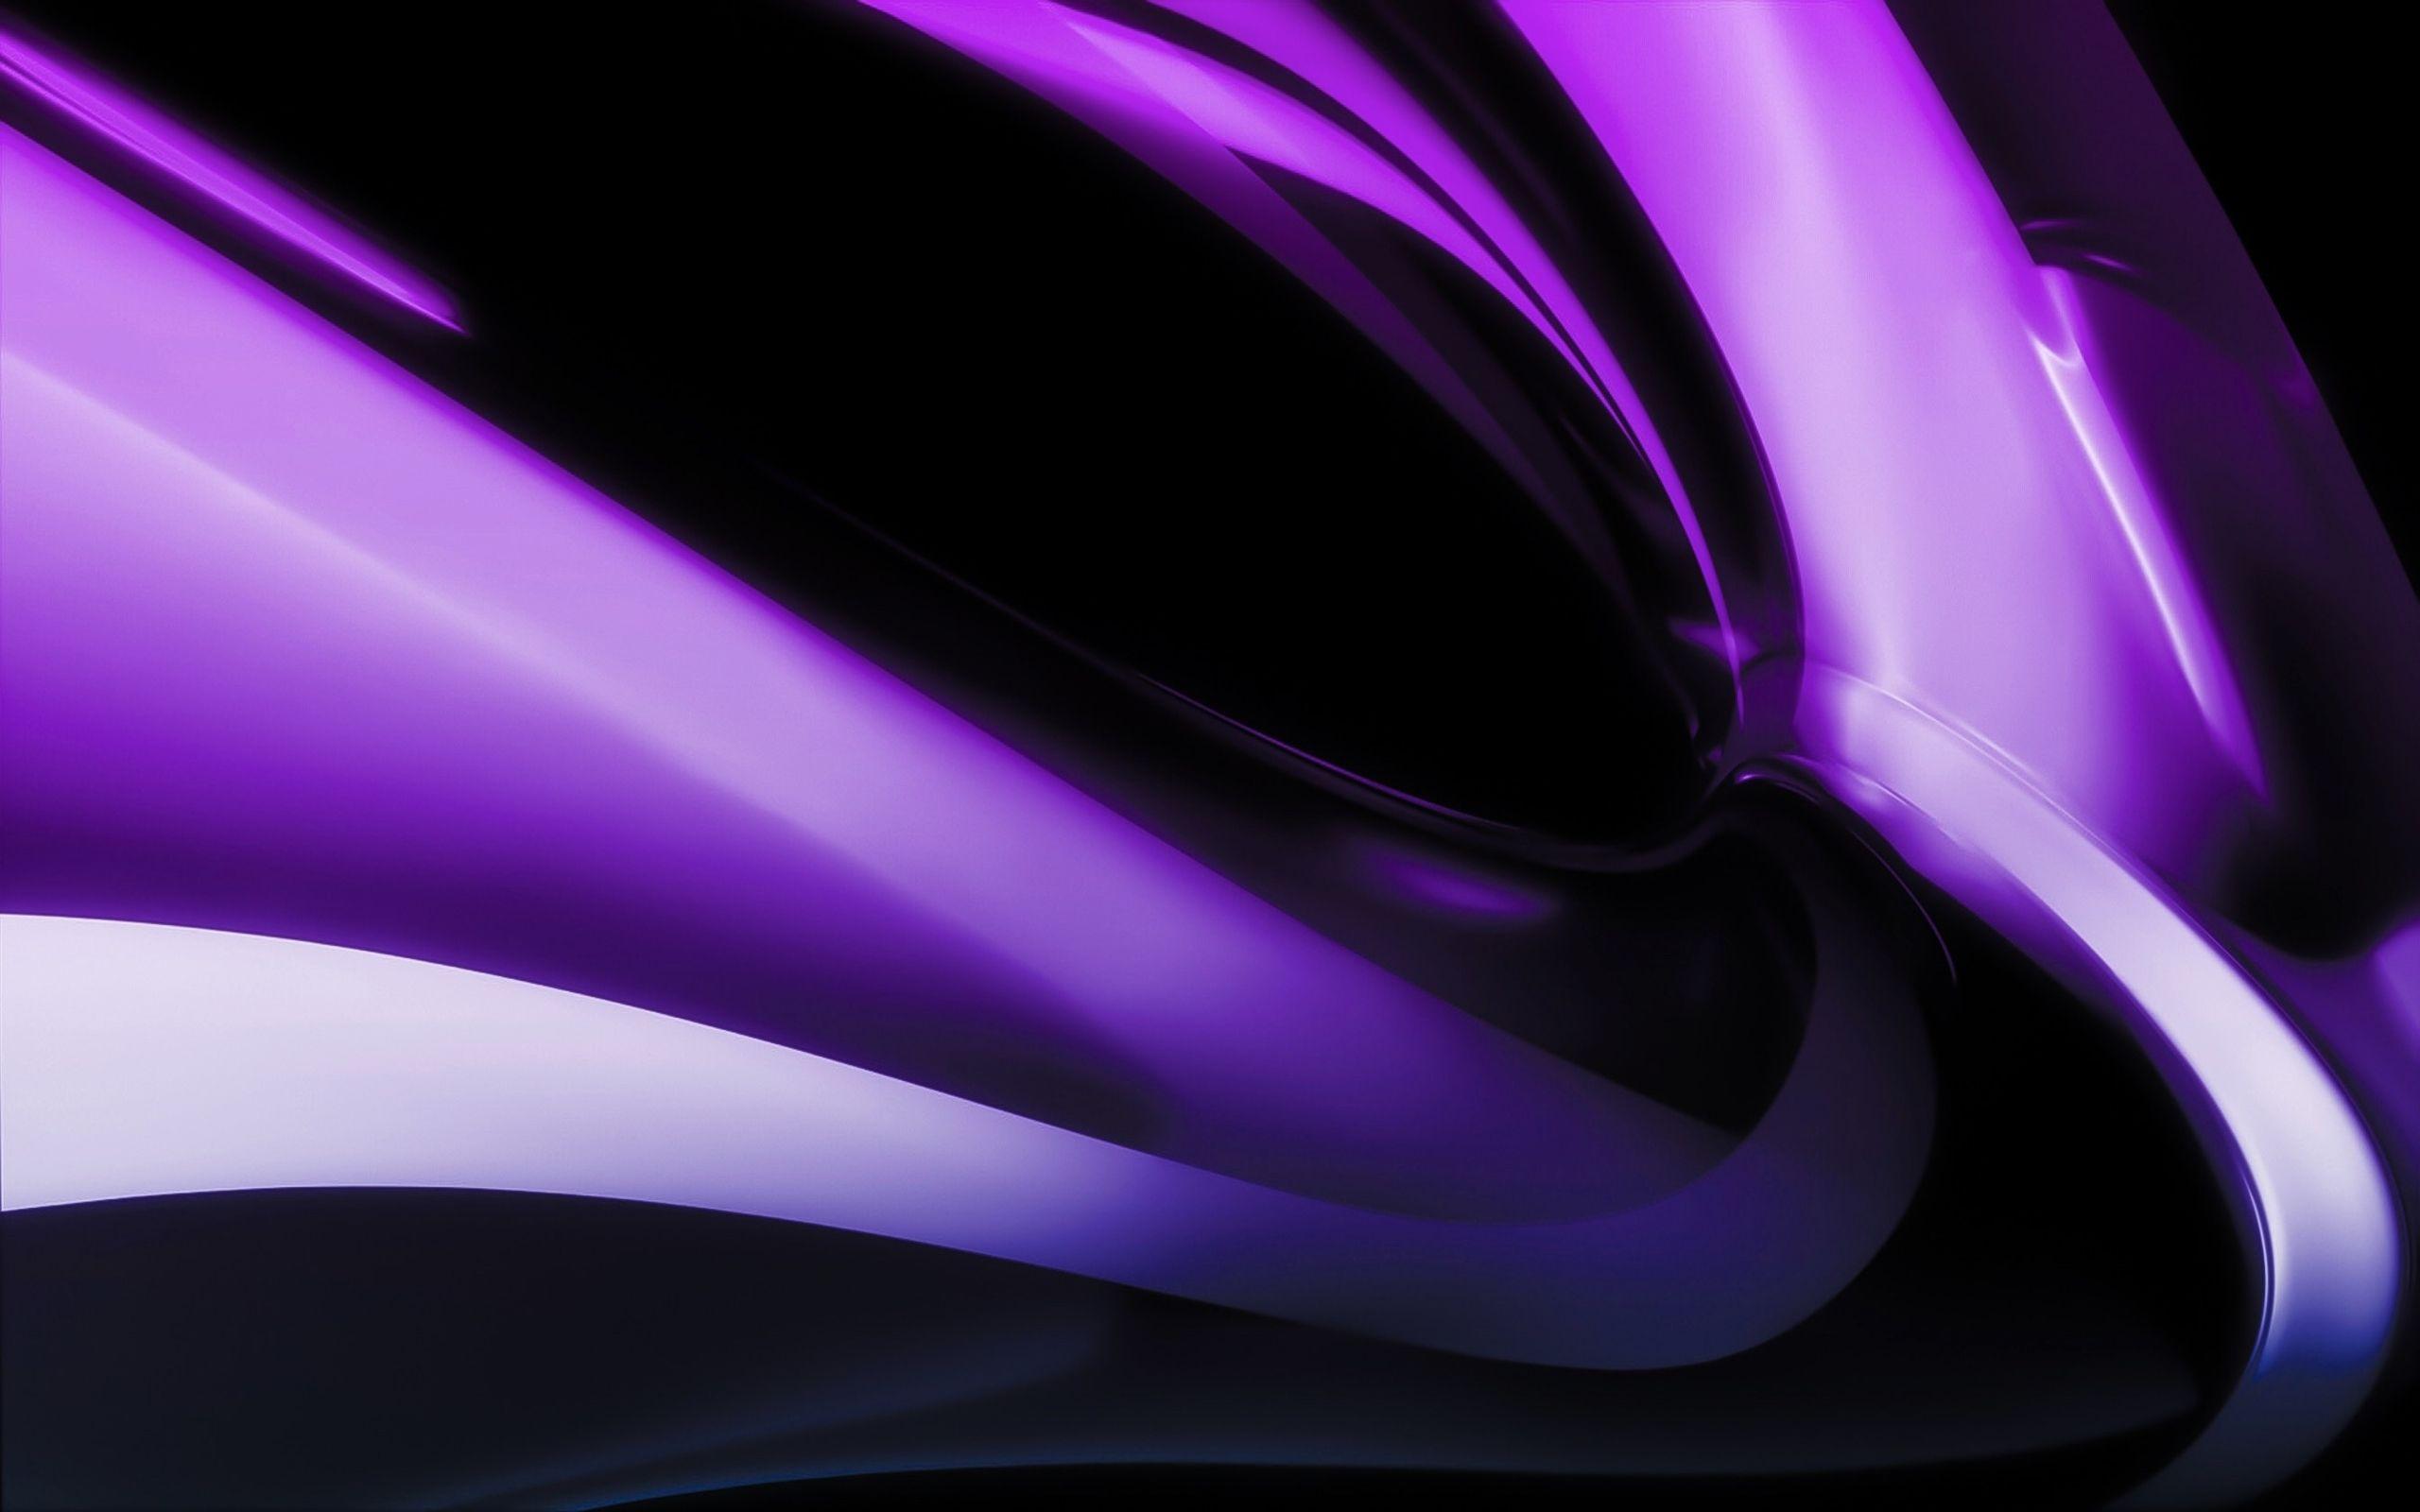 Sort by relevance aesthetic 1080p, 2k, 4k, 5k hd wallpapers free download. Aesthetic Purple Macbook Wallpapers - Wallpaper Cave